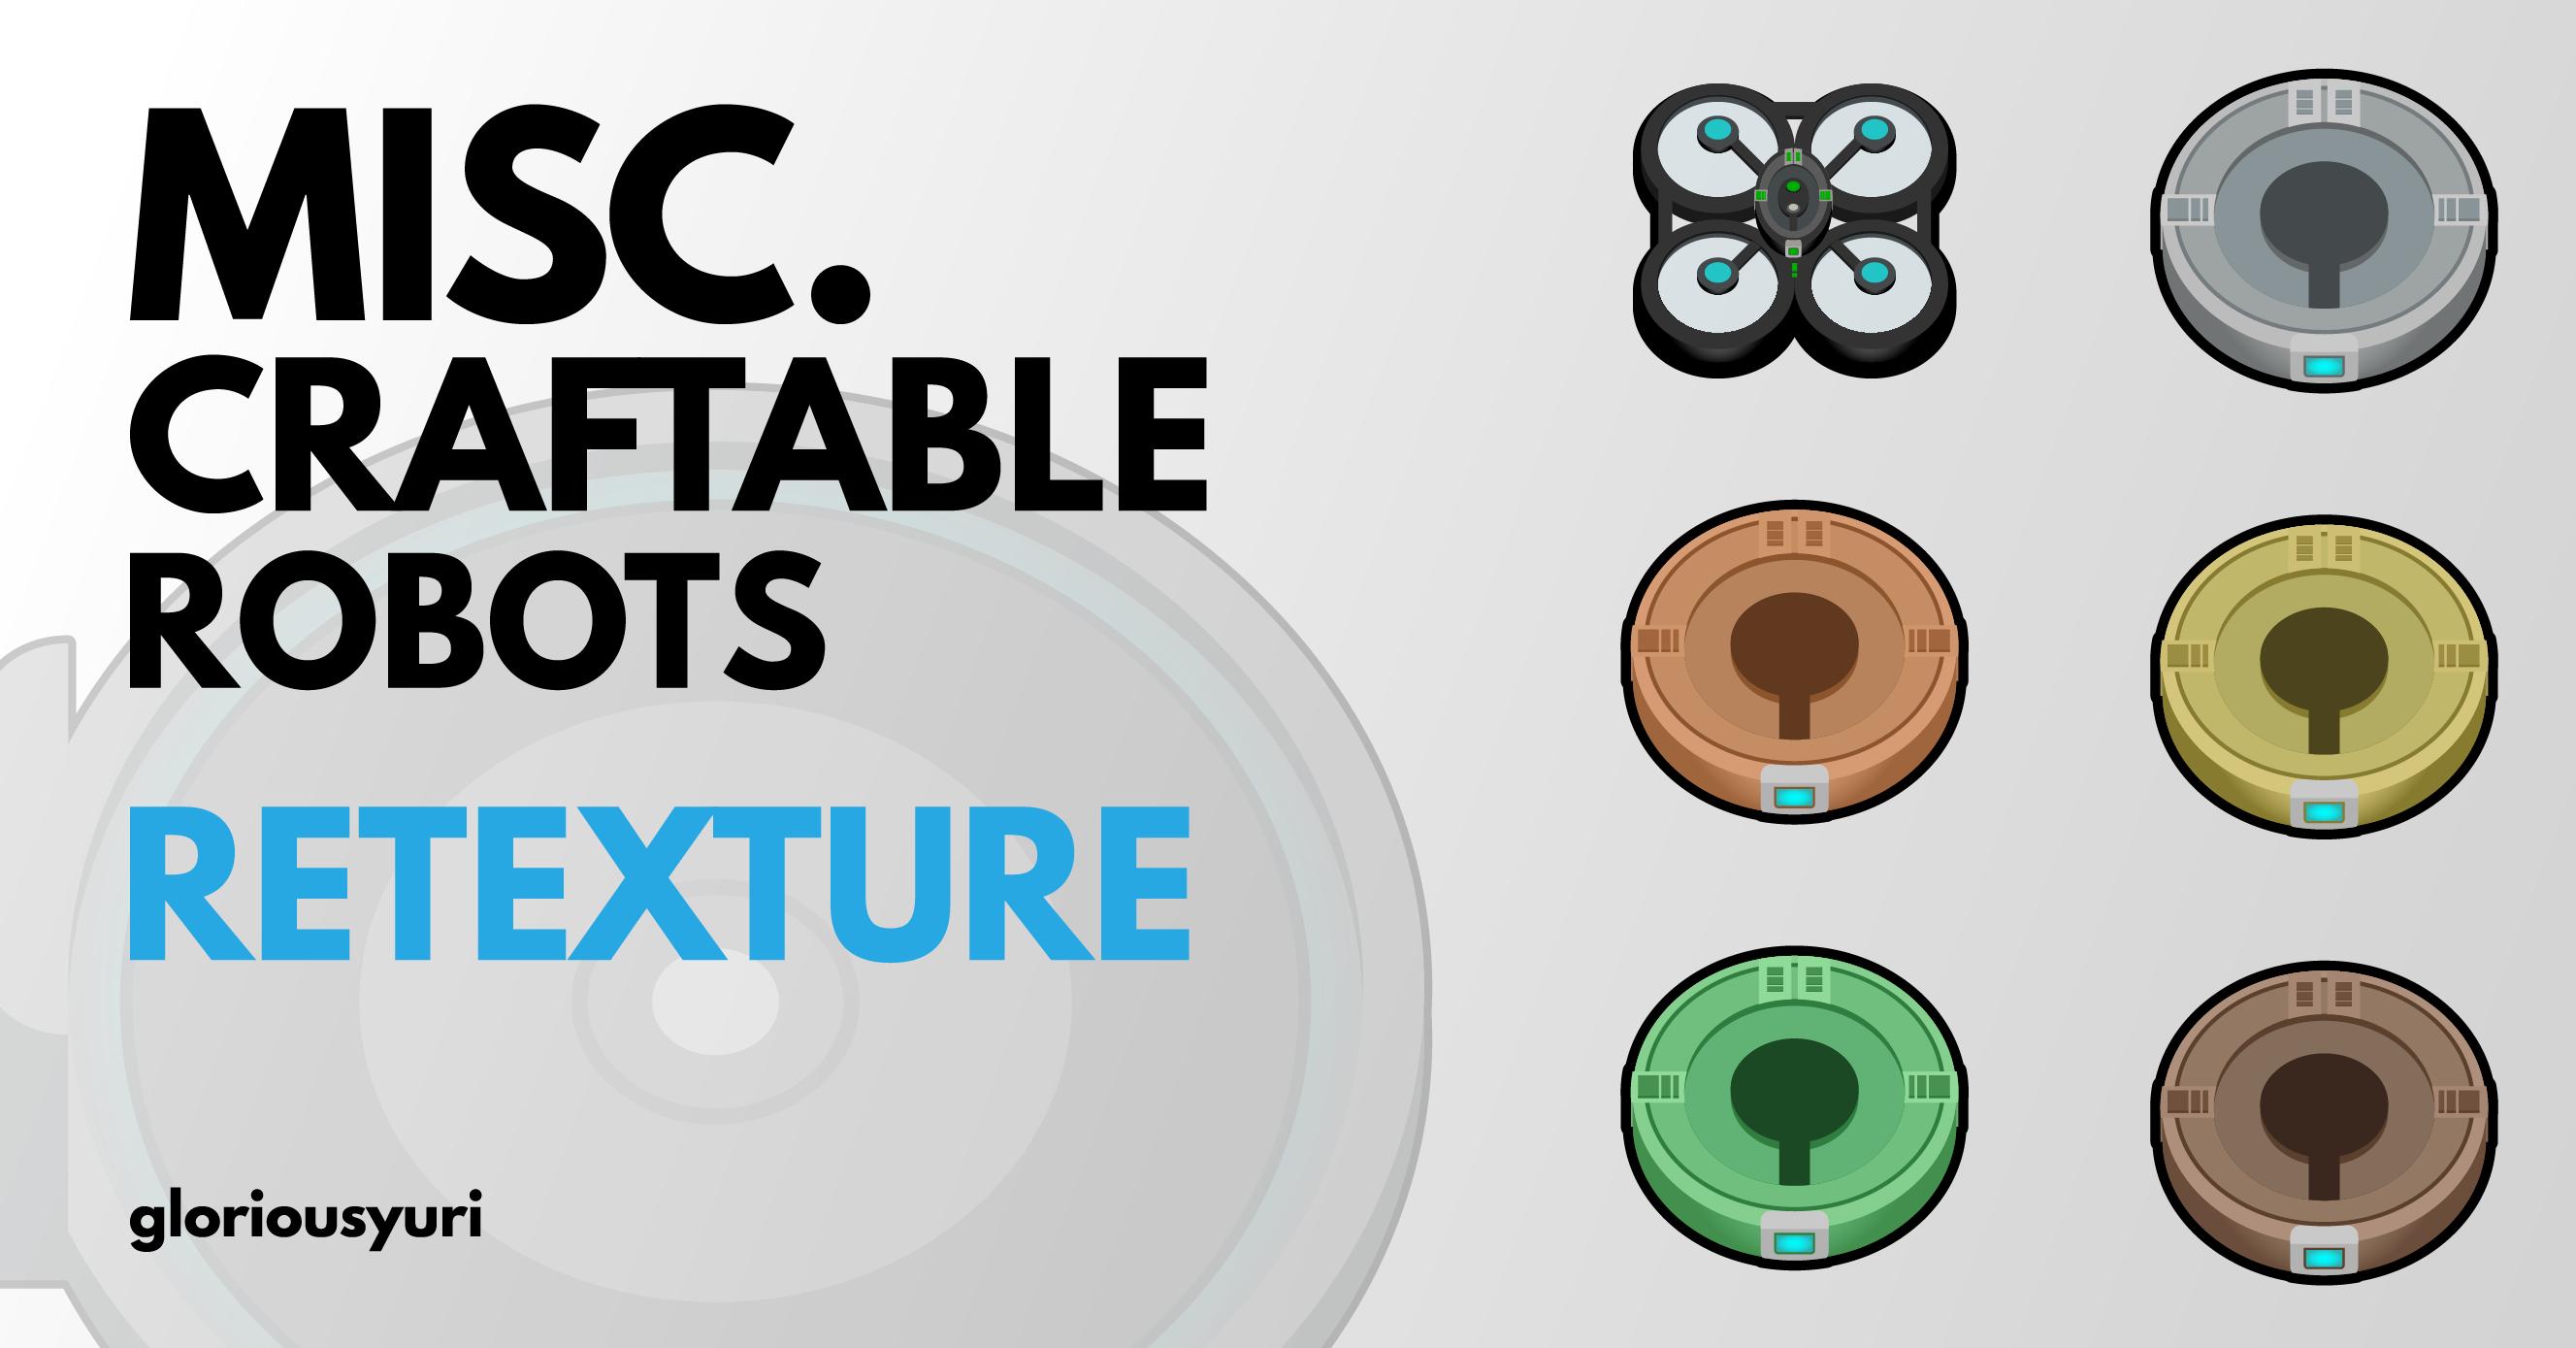 Misc. Craftable Robots Retexture [1.1, 1.2]